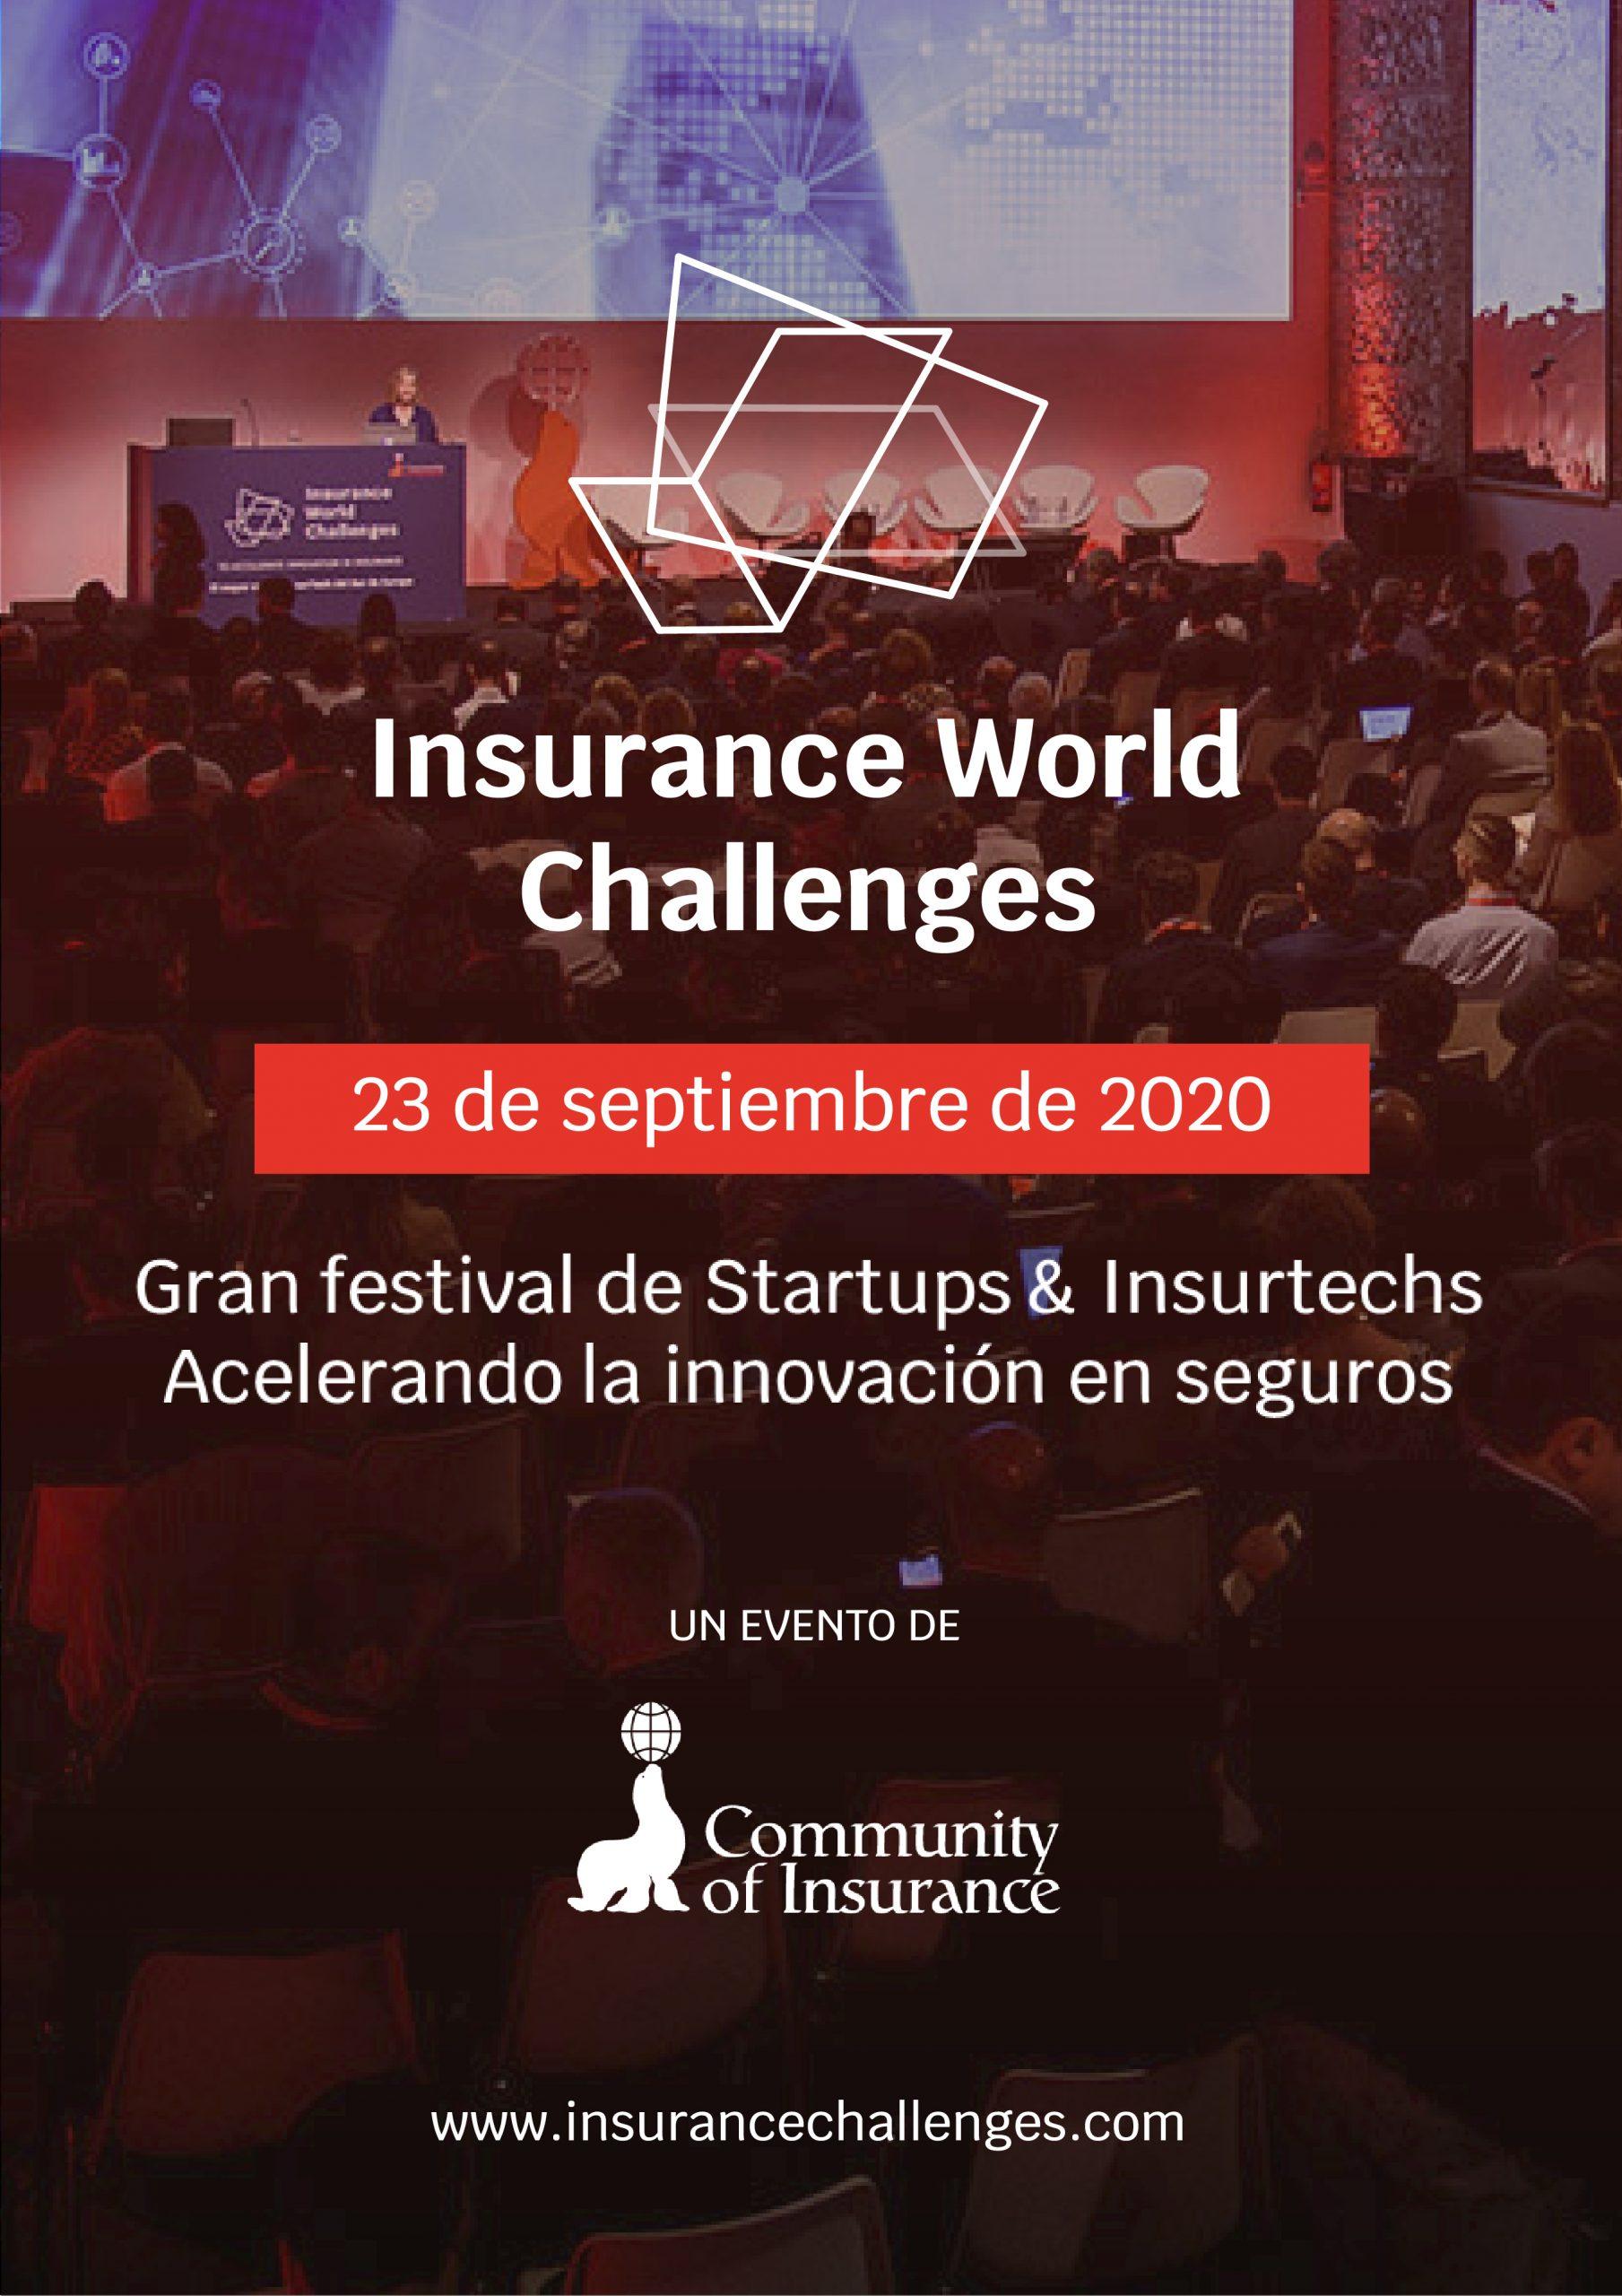 Insurance World Challenges